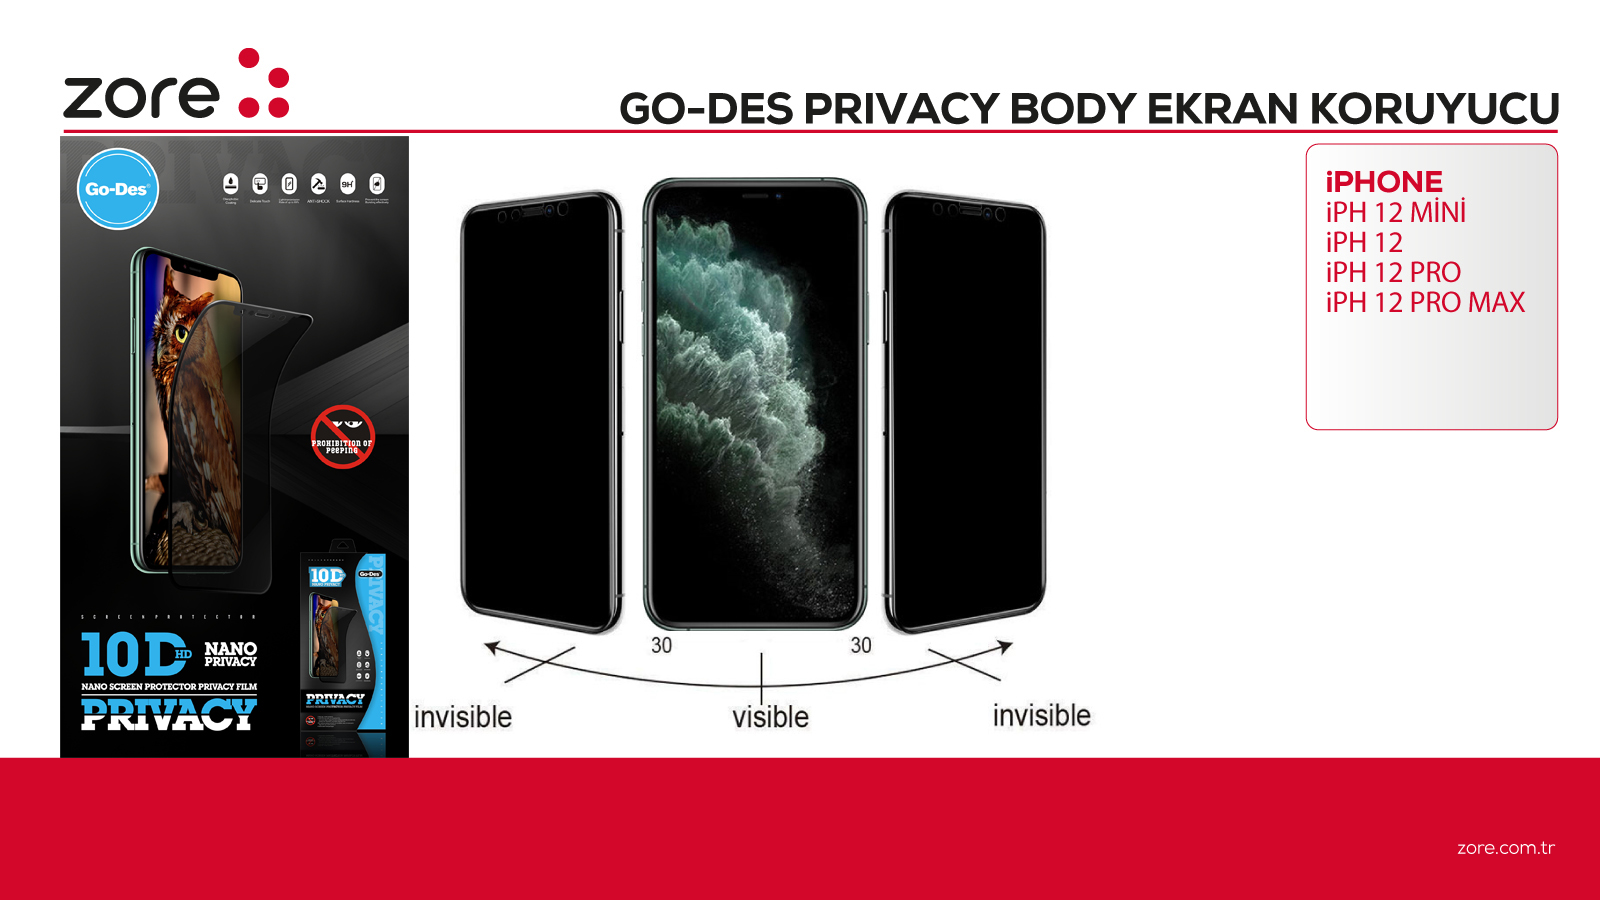 go-des privacyyy.jpg (354 KB)